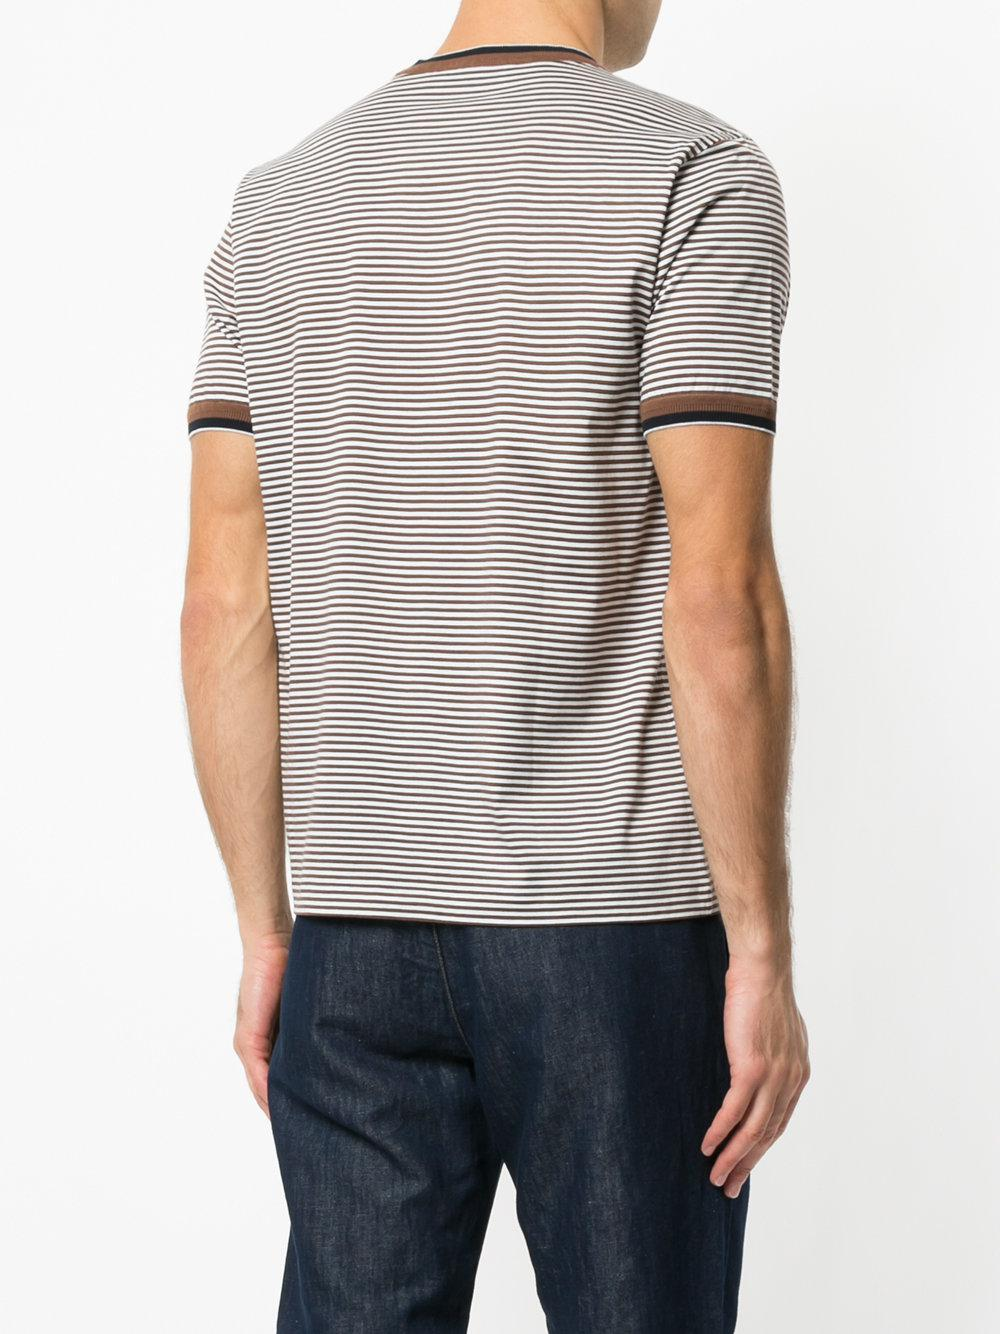 rayas Marrón a contraste Cerruti en Camiseta zxHFq5Sw